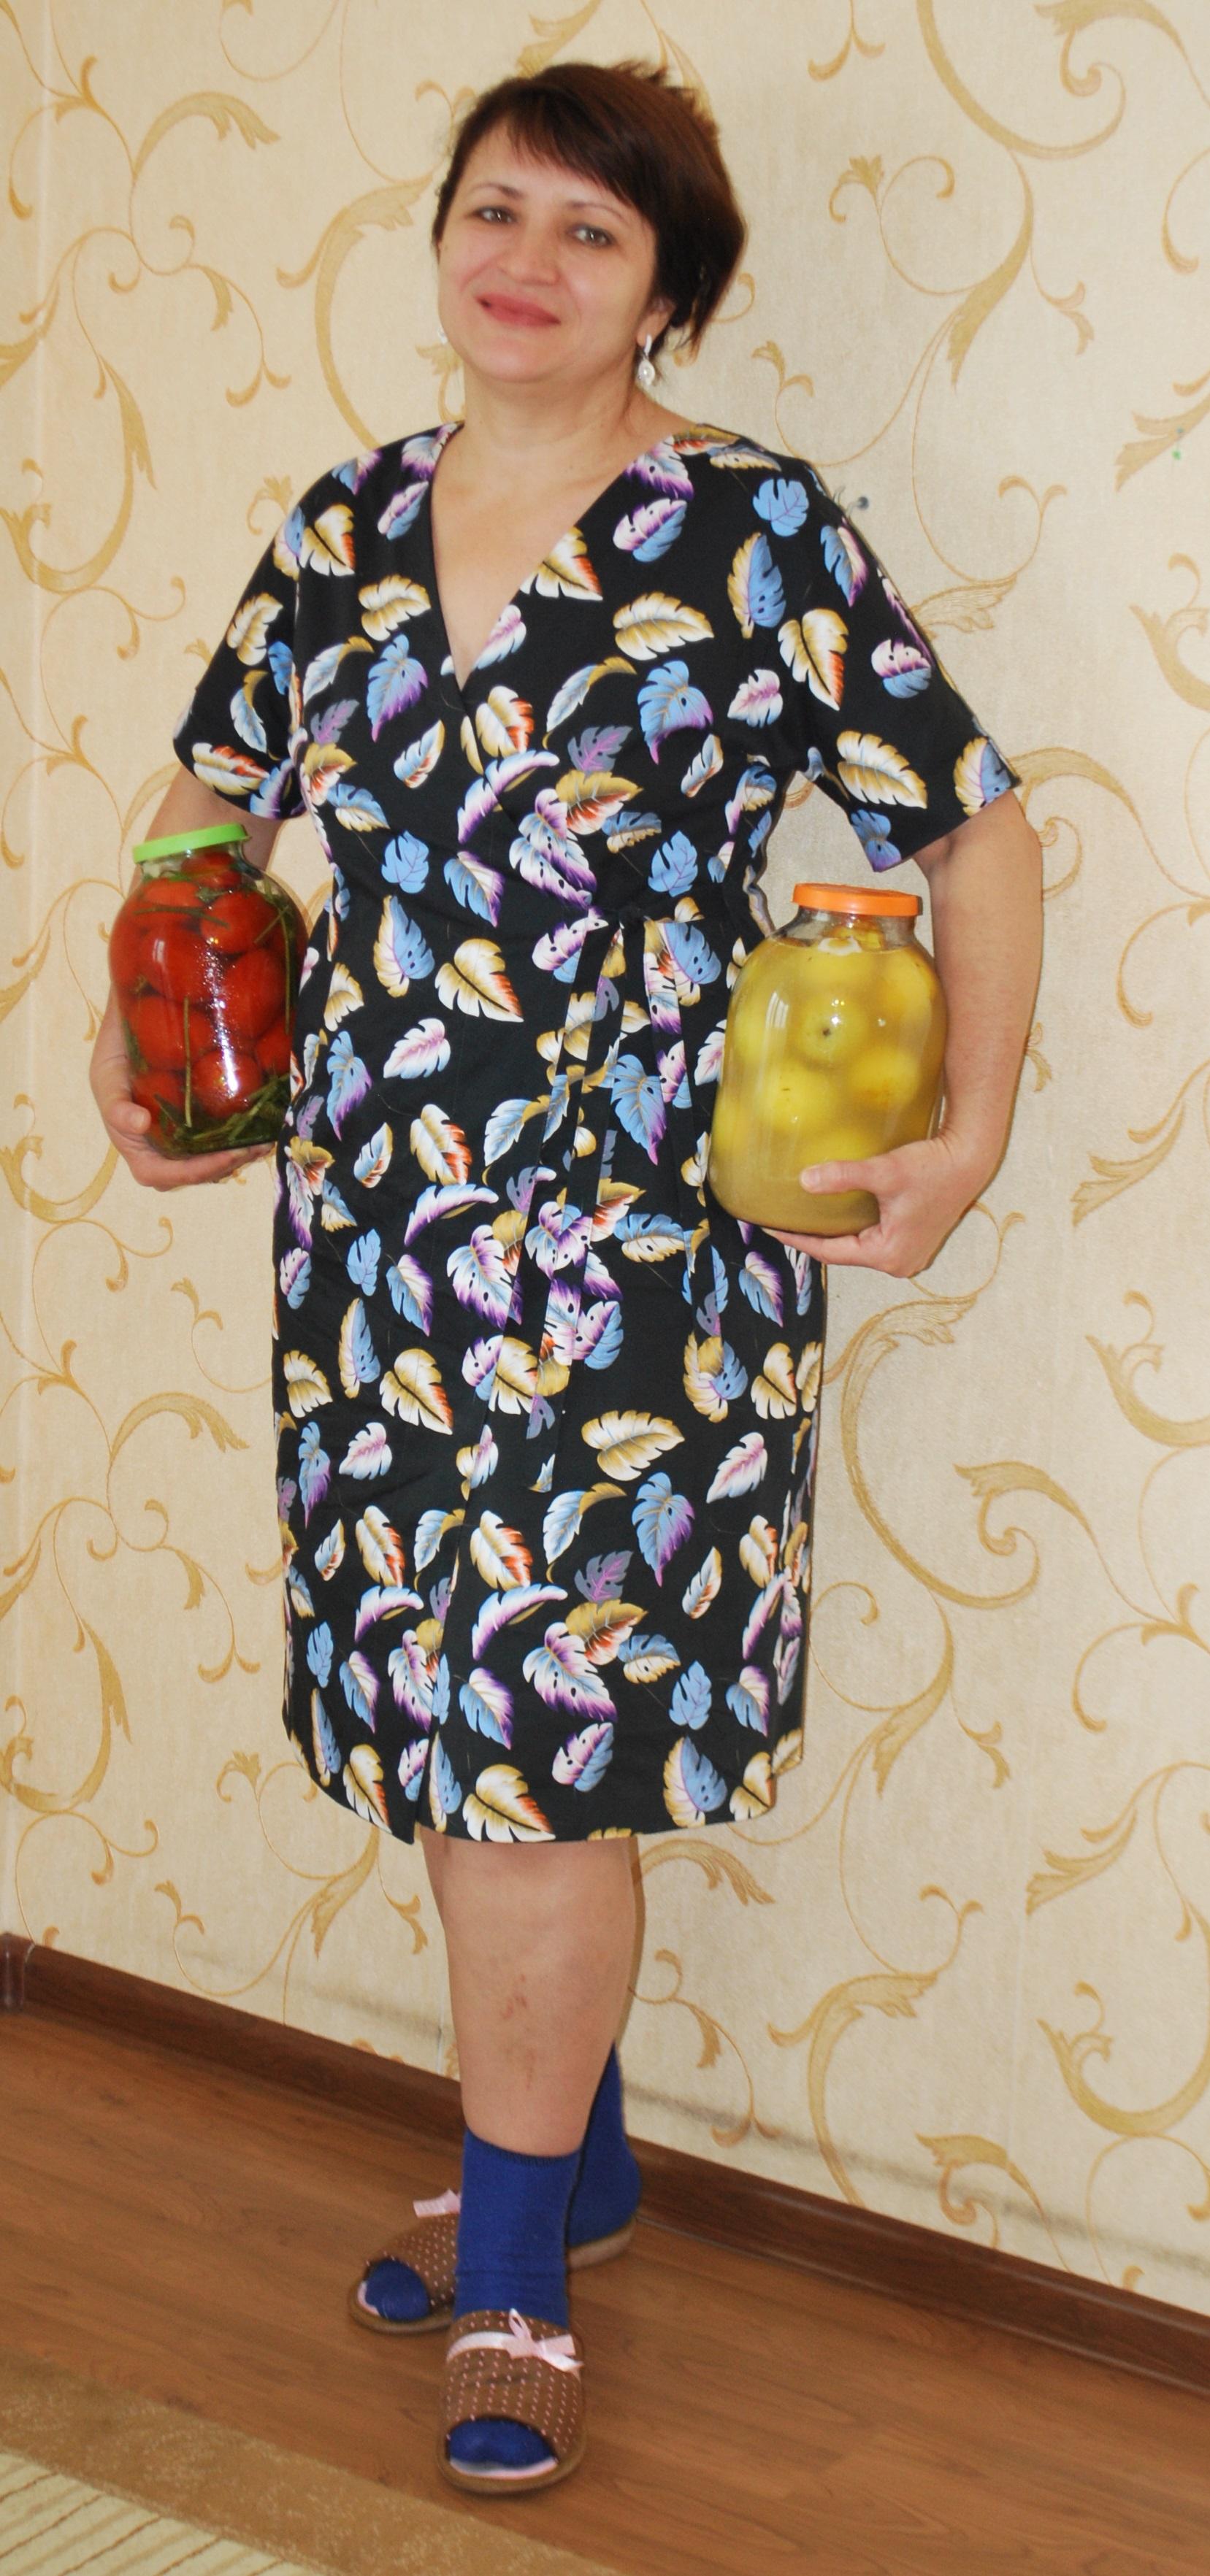 Домашній халат або сукня з запахом  8f1c9f5e39aeb